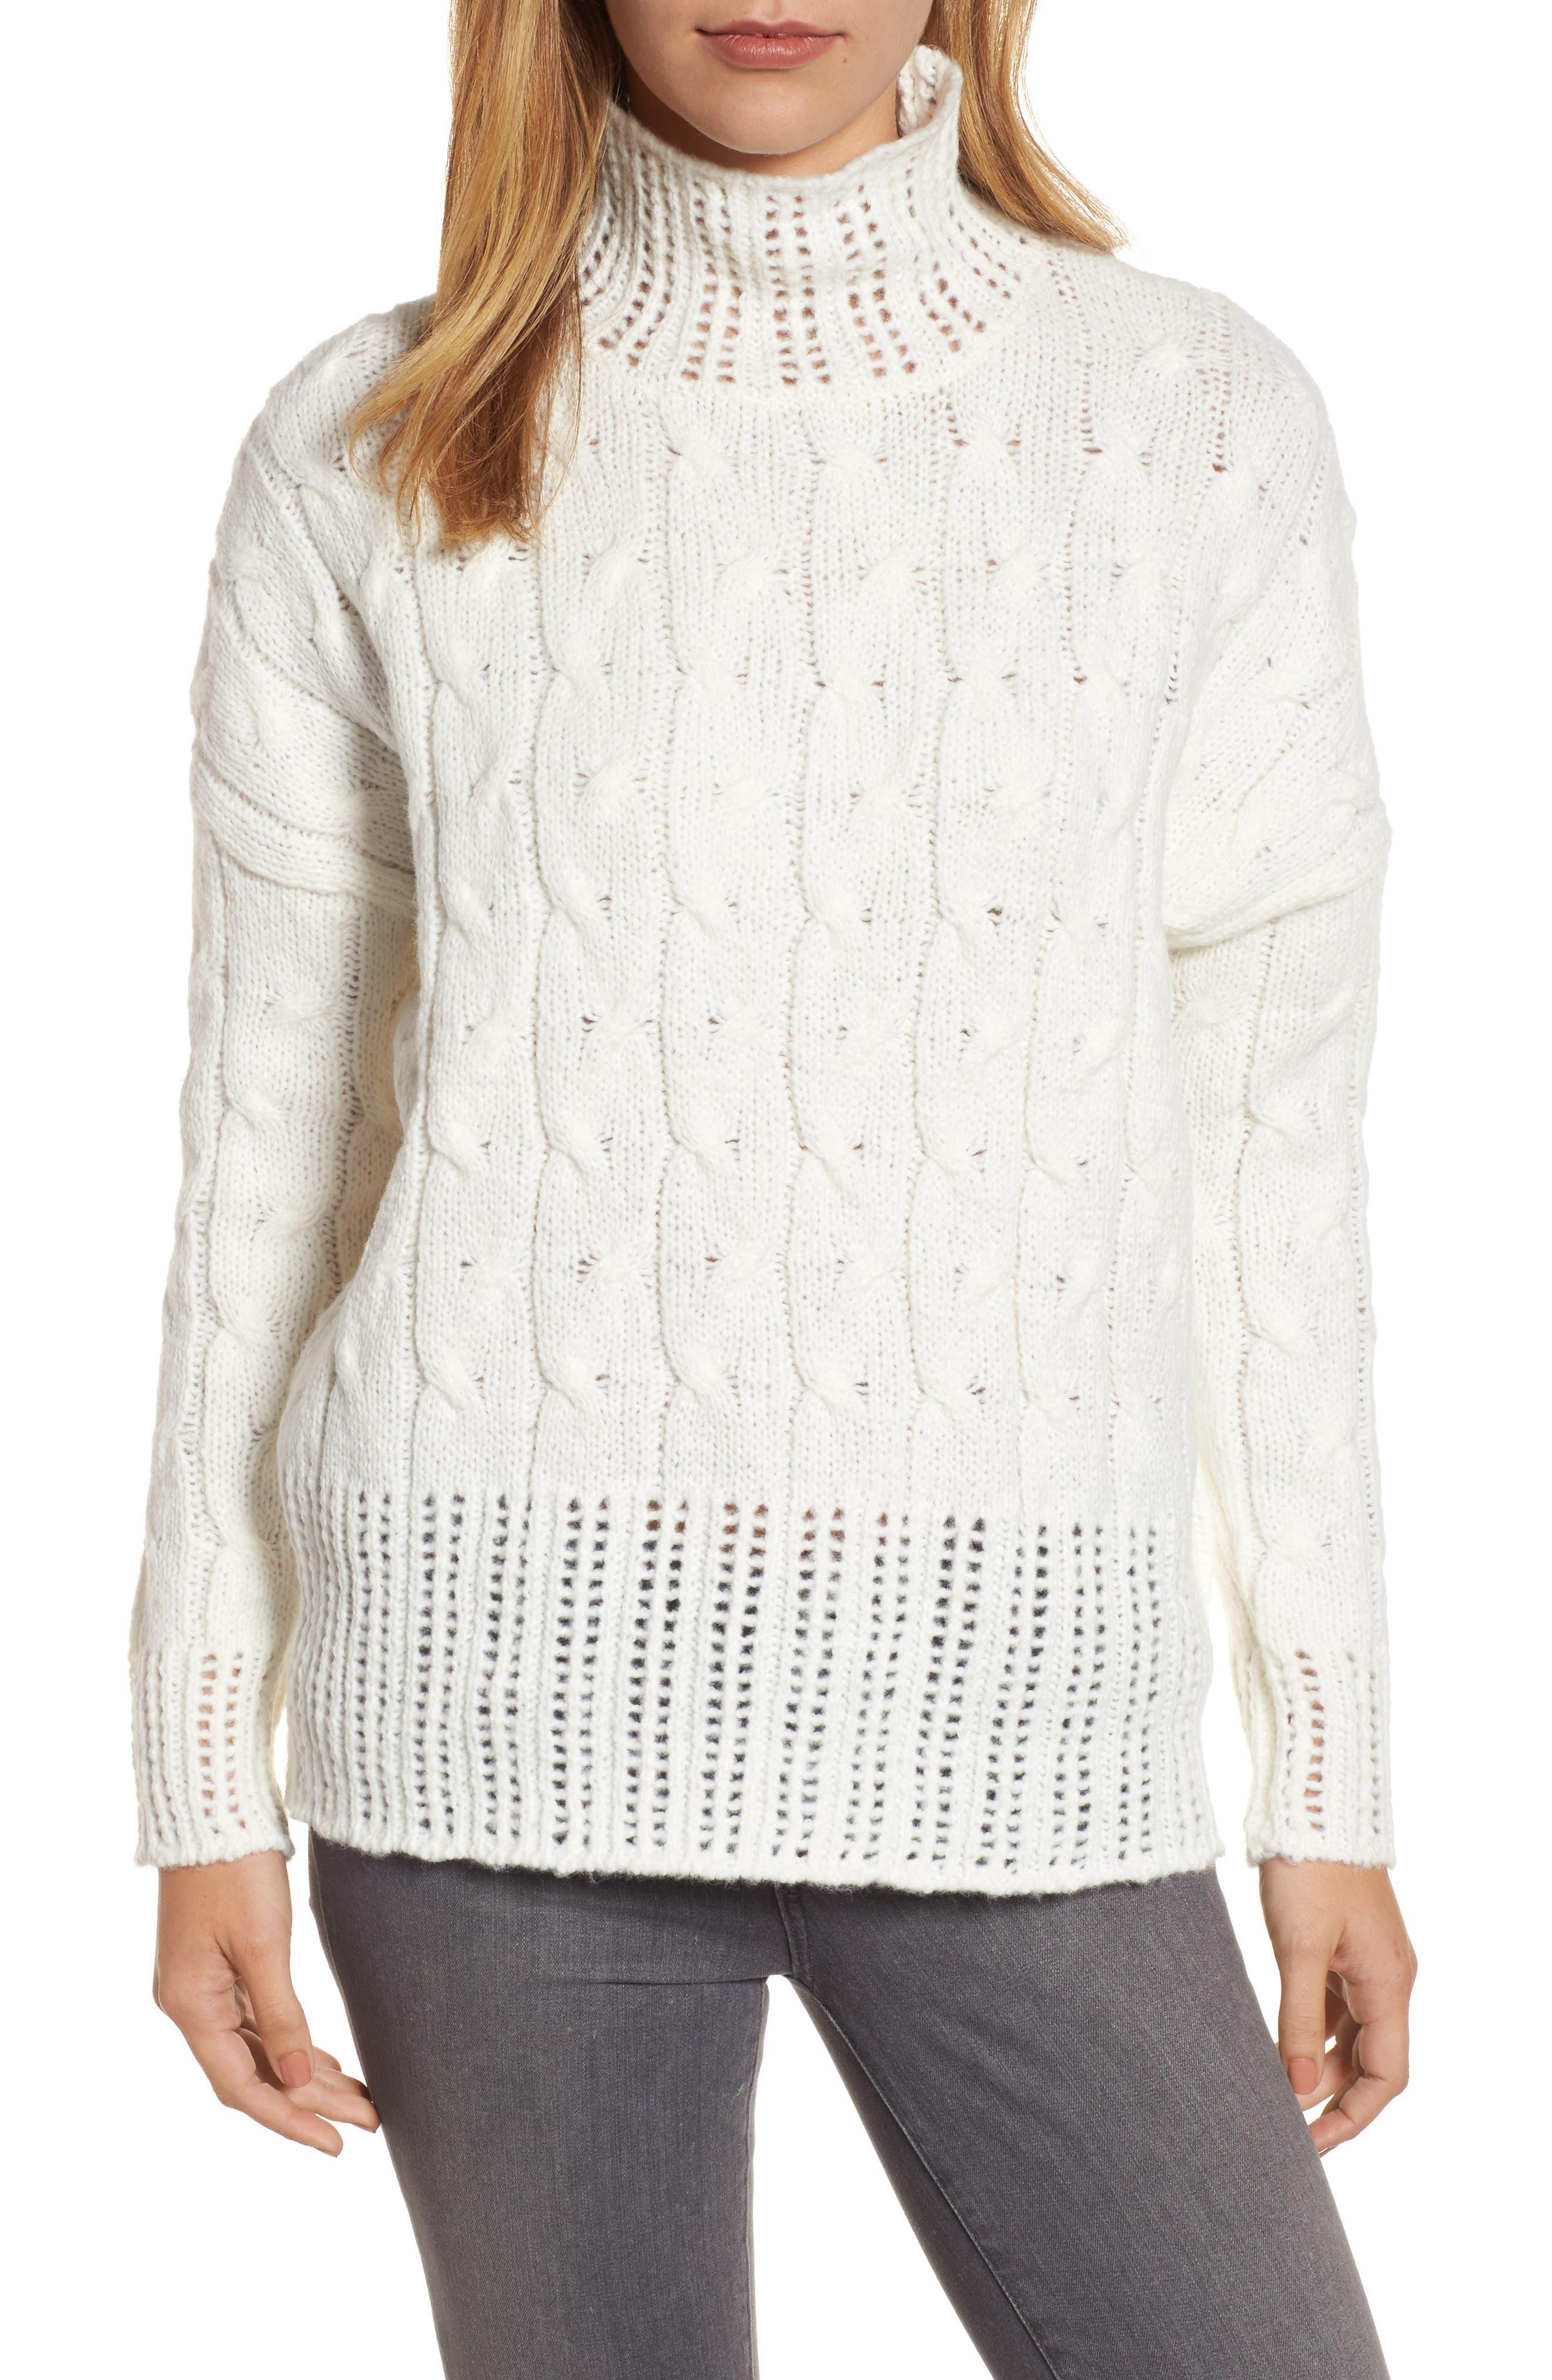 Main Image - Press Pointelle Turtleneck Sweater